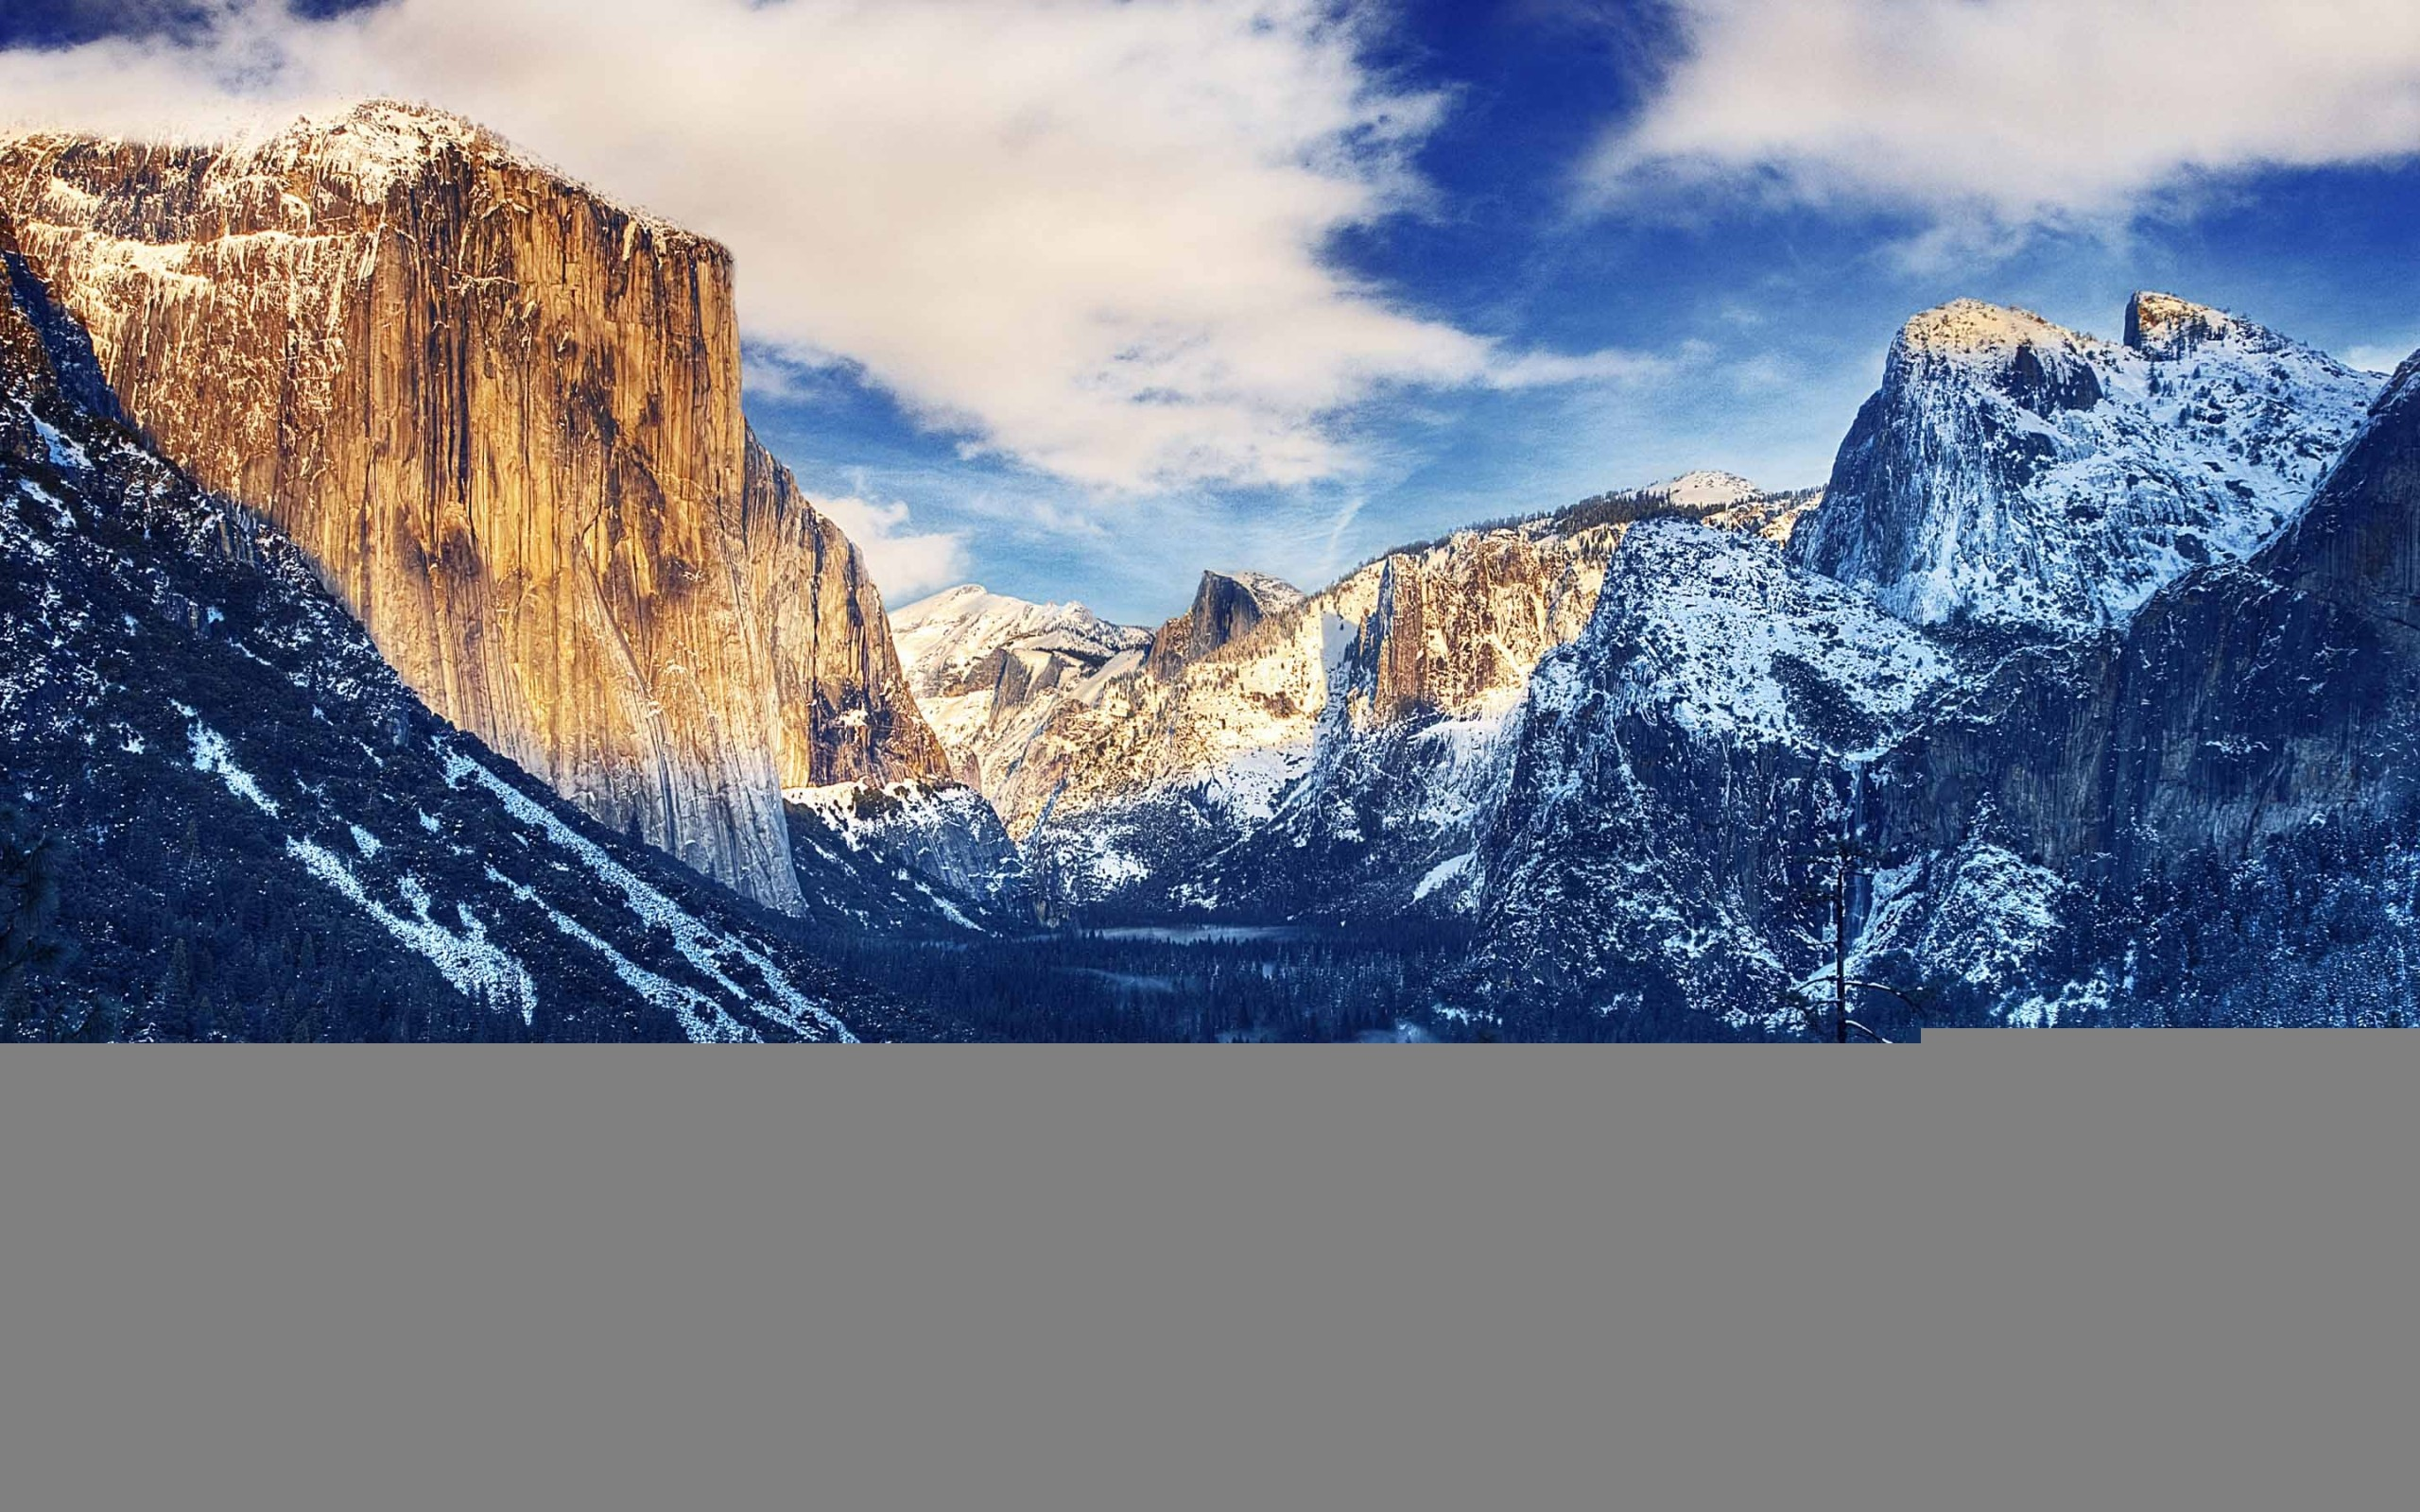 Yellowstone-National-Park-wallpapers-5.jpg ...